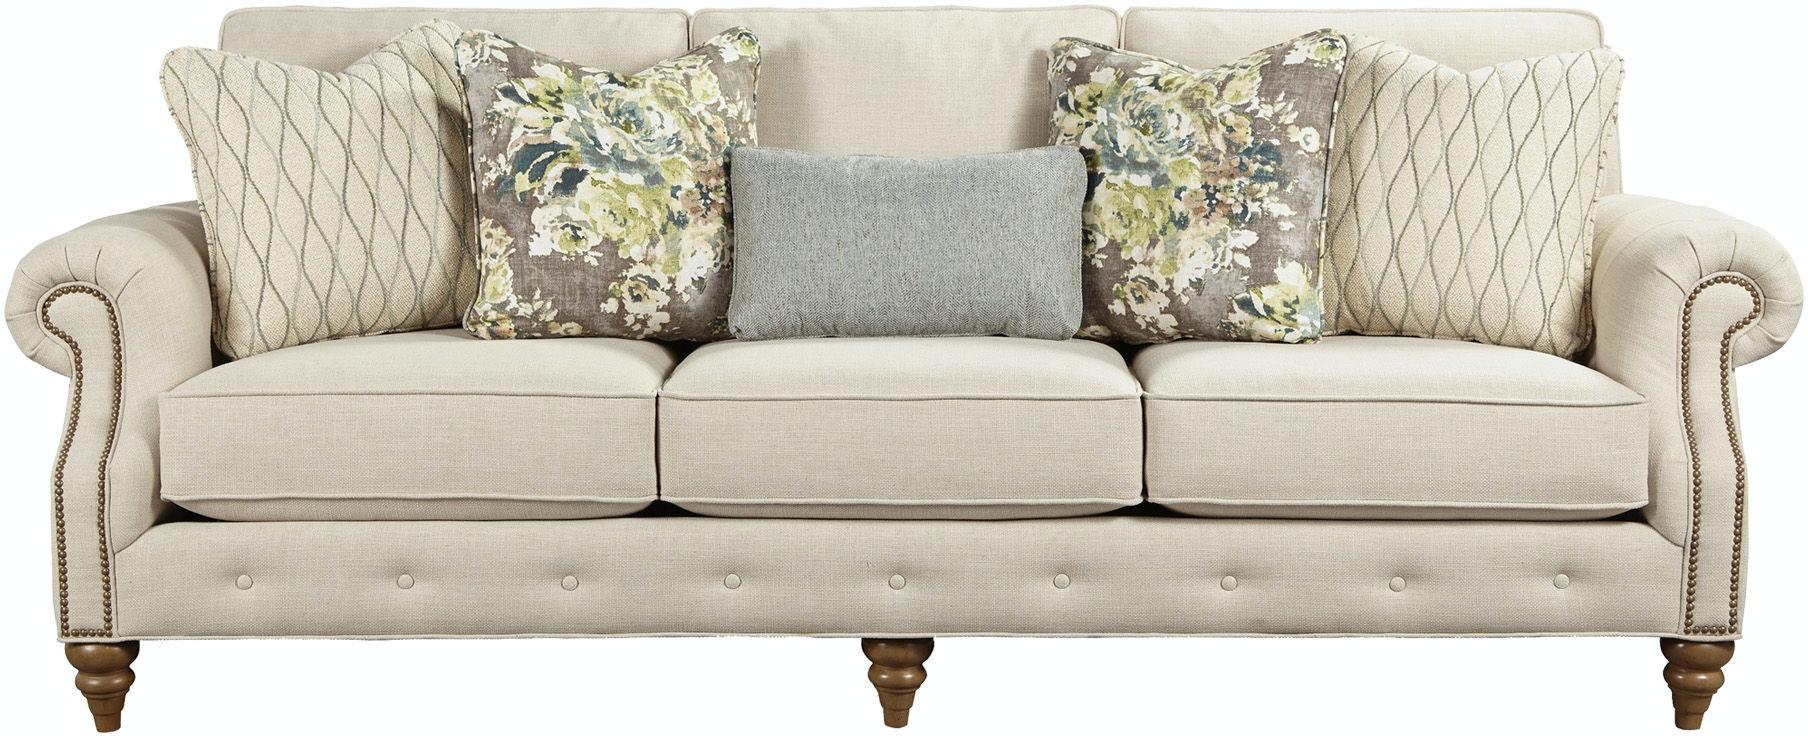 paula deencraftmaster living room sofa p763250bd - craftmaster